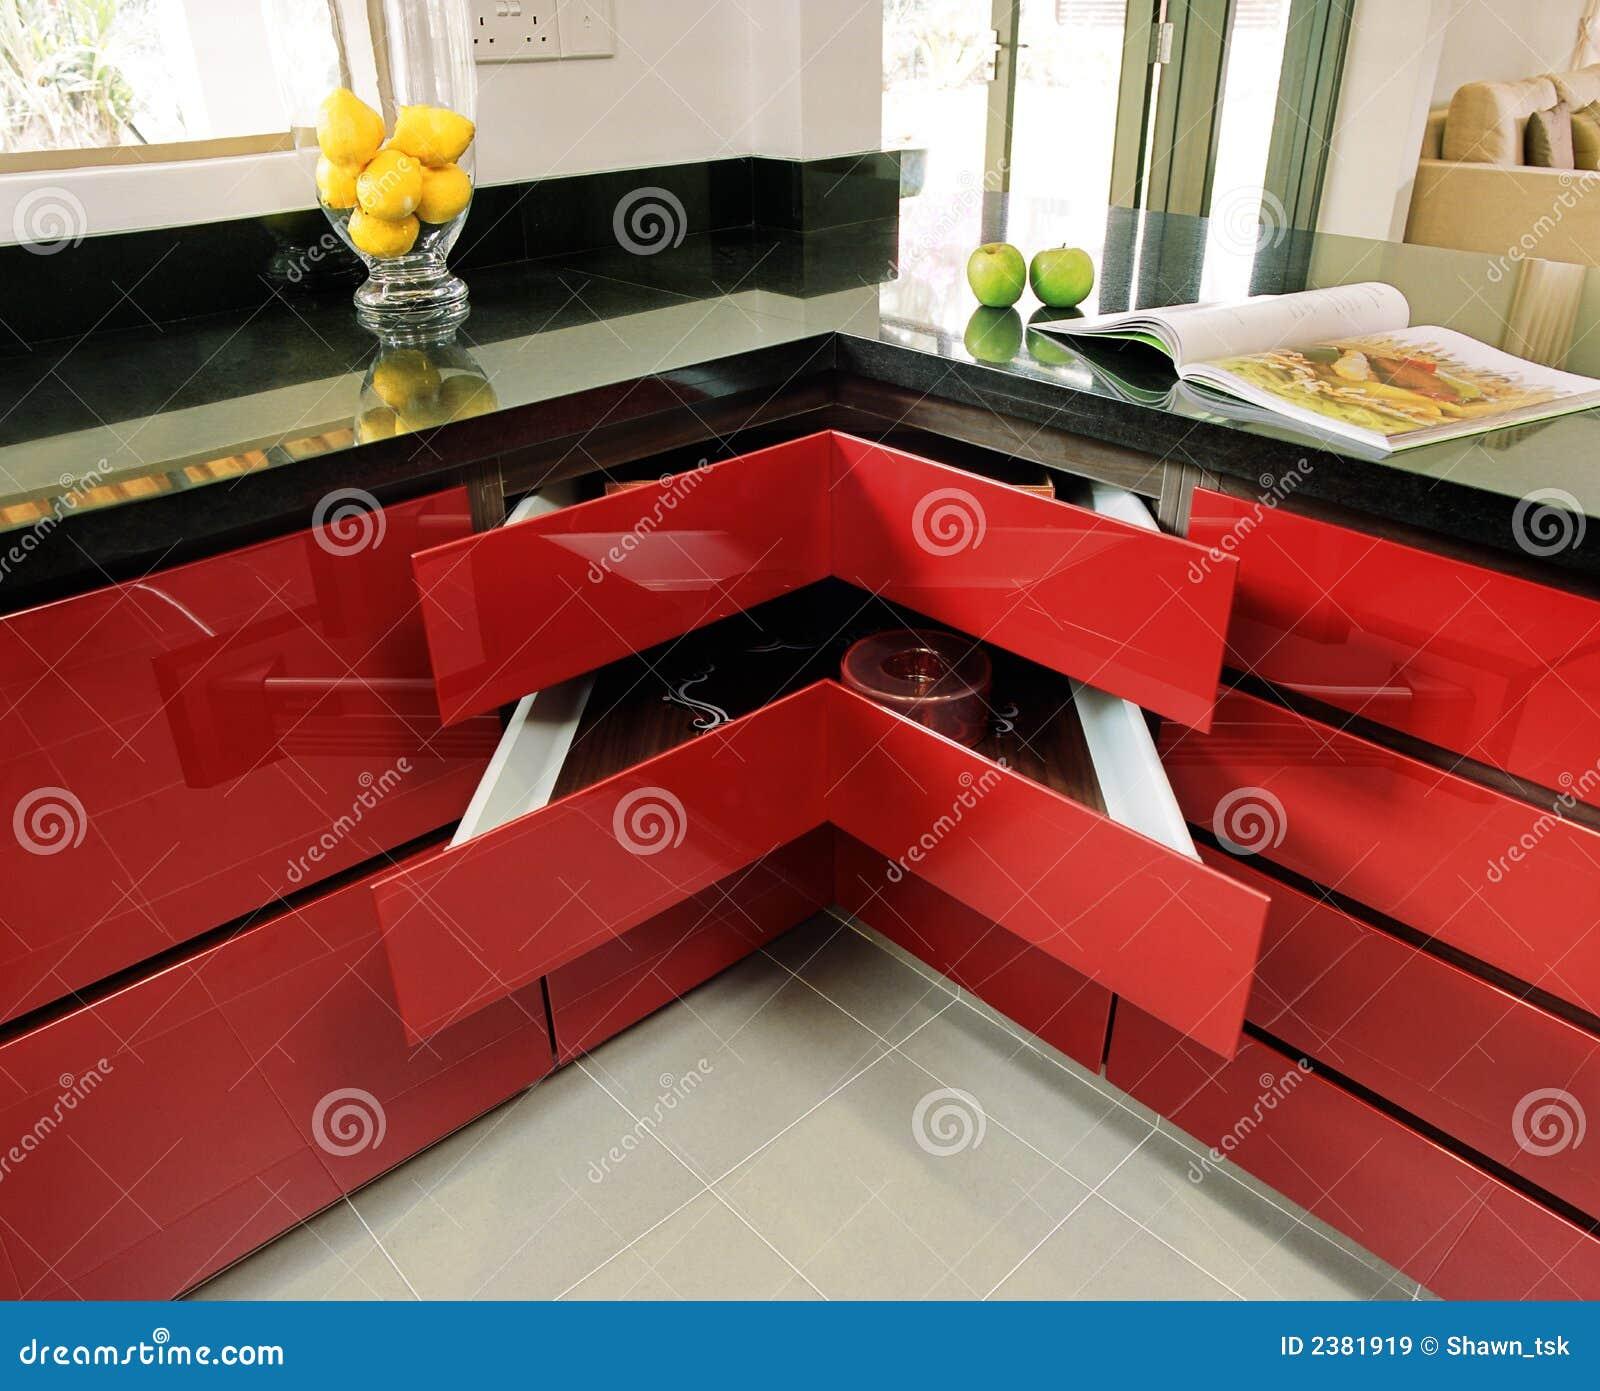 Gabinete de cozinha na pintura de pulverizador vermelha. #BA9B11 1300 1147